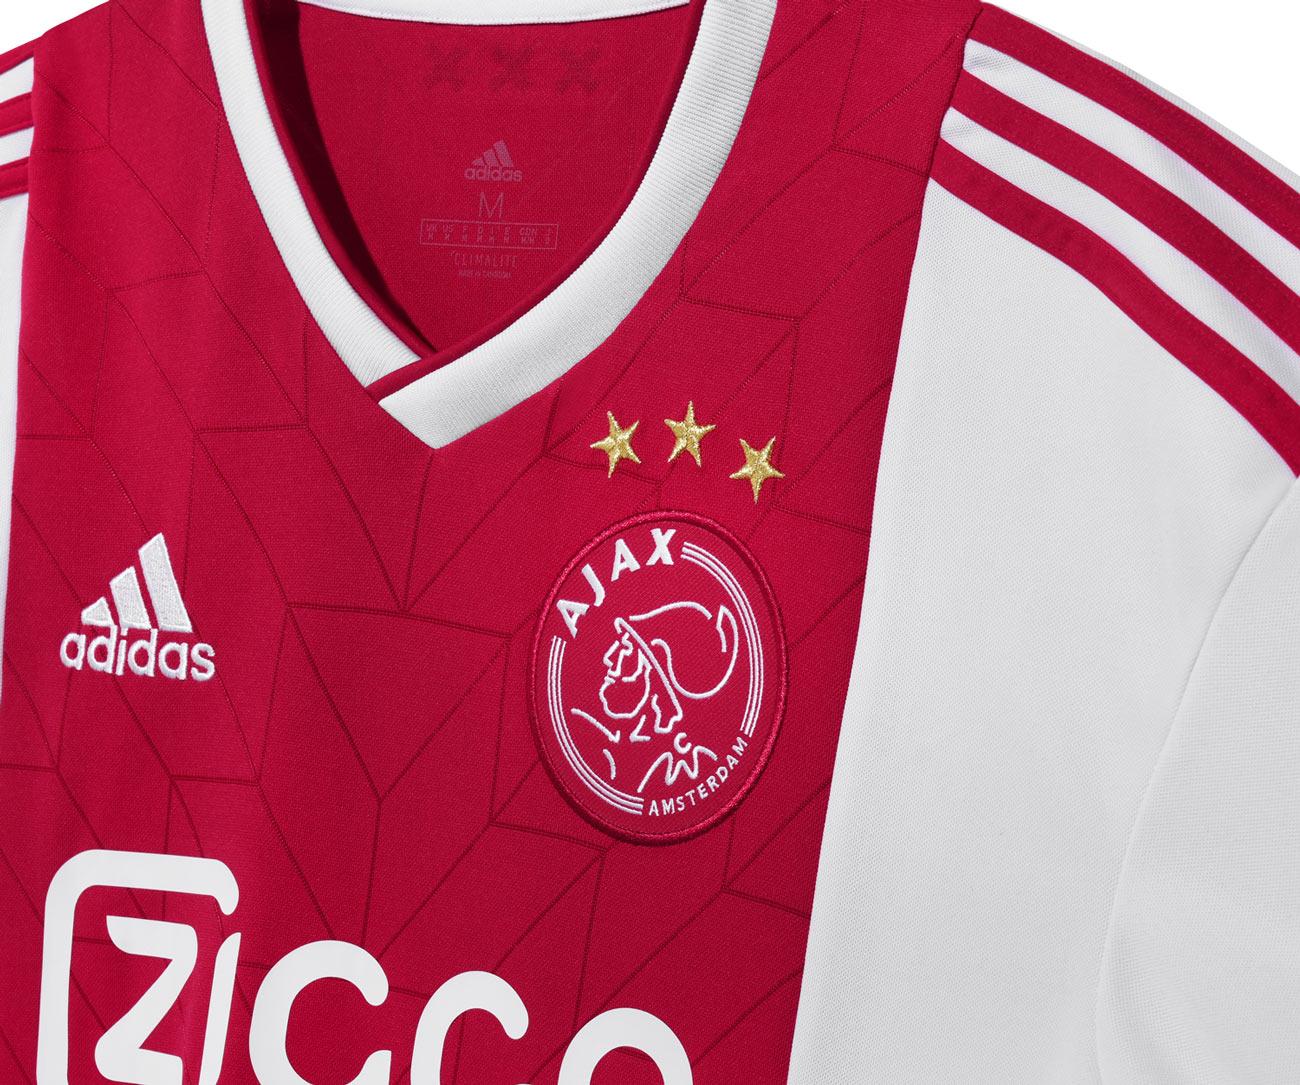 Maglie Ajax 2018-2019, design retrò e tocchi dorati per adidas